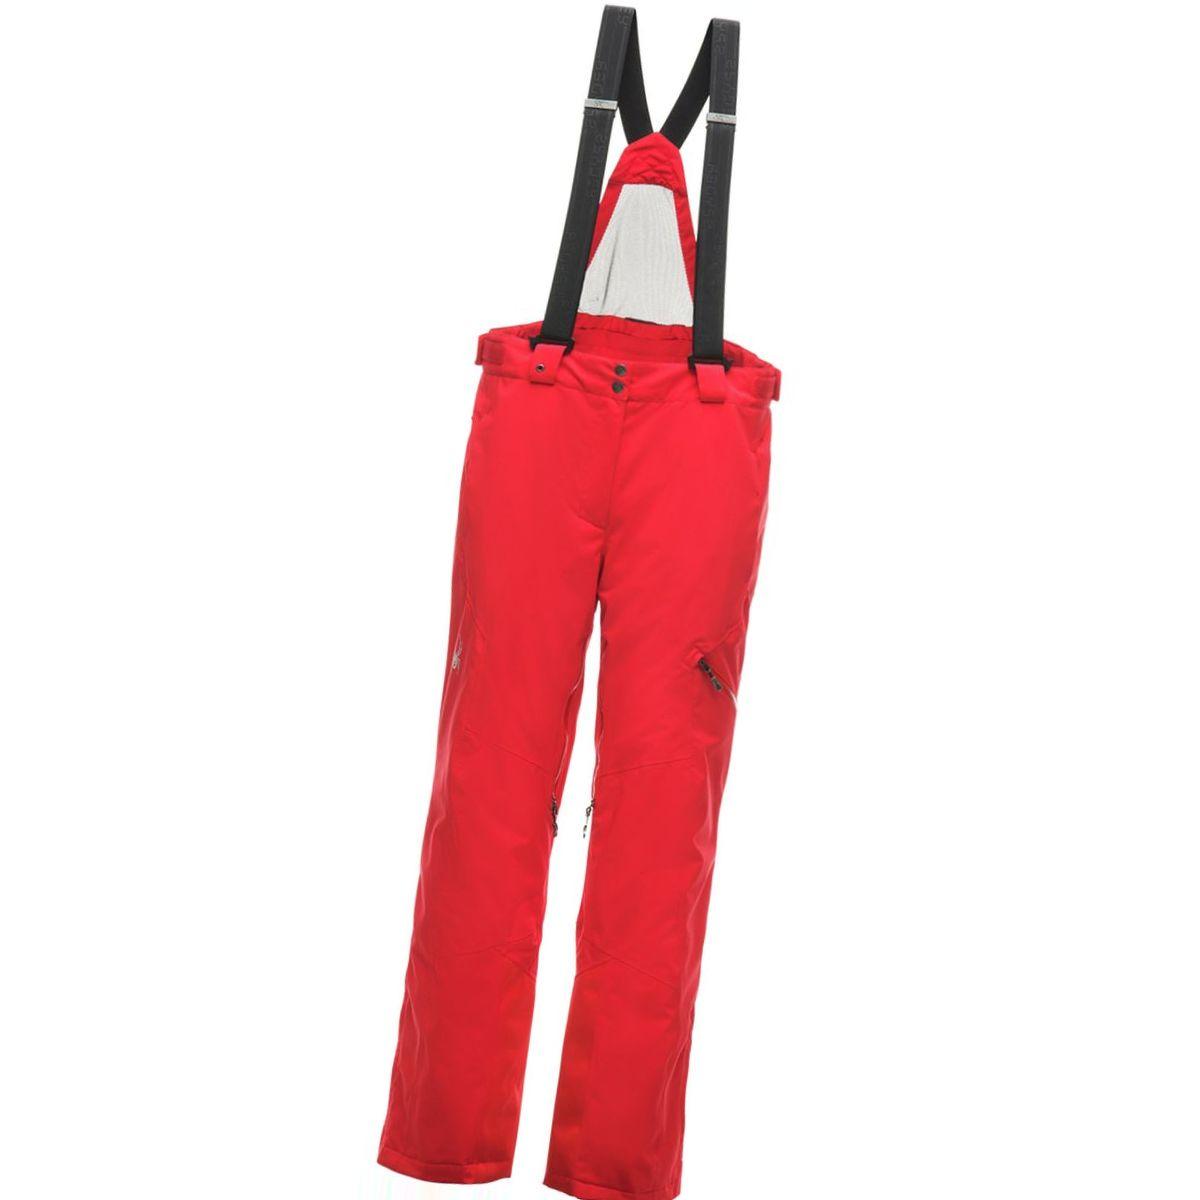 Spyder Dare Regular Pant - Men's